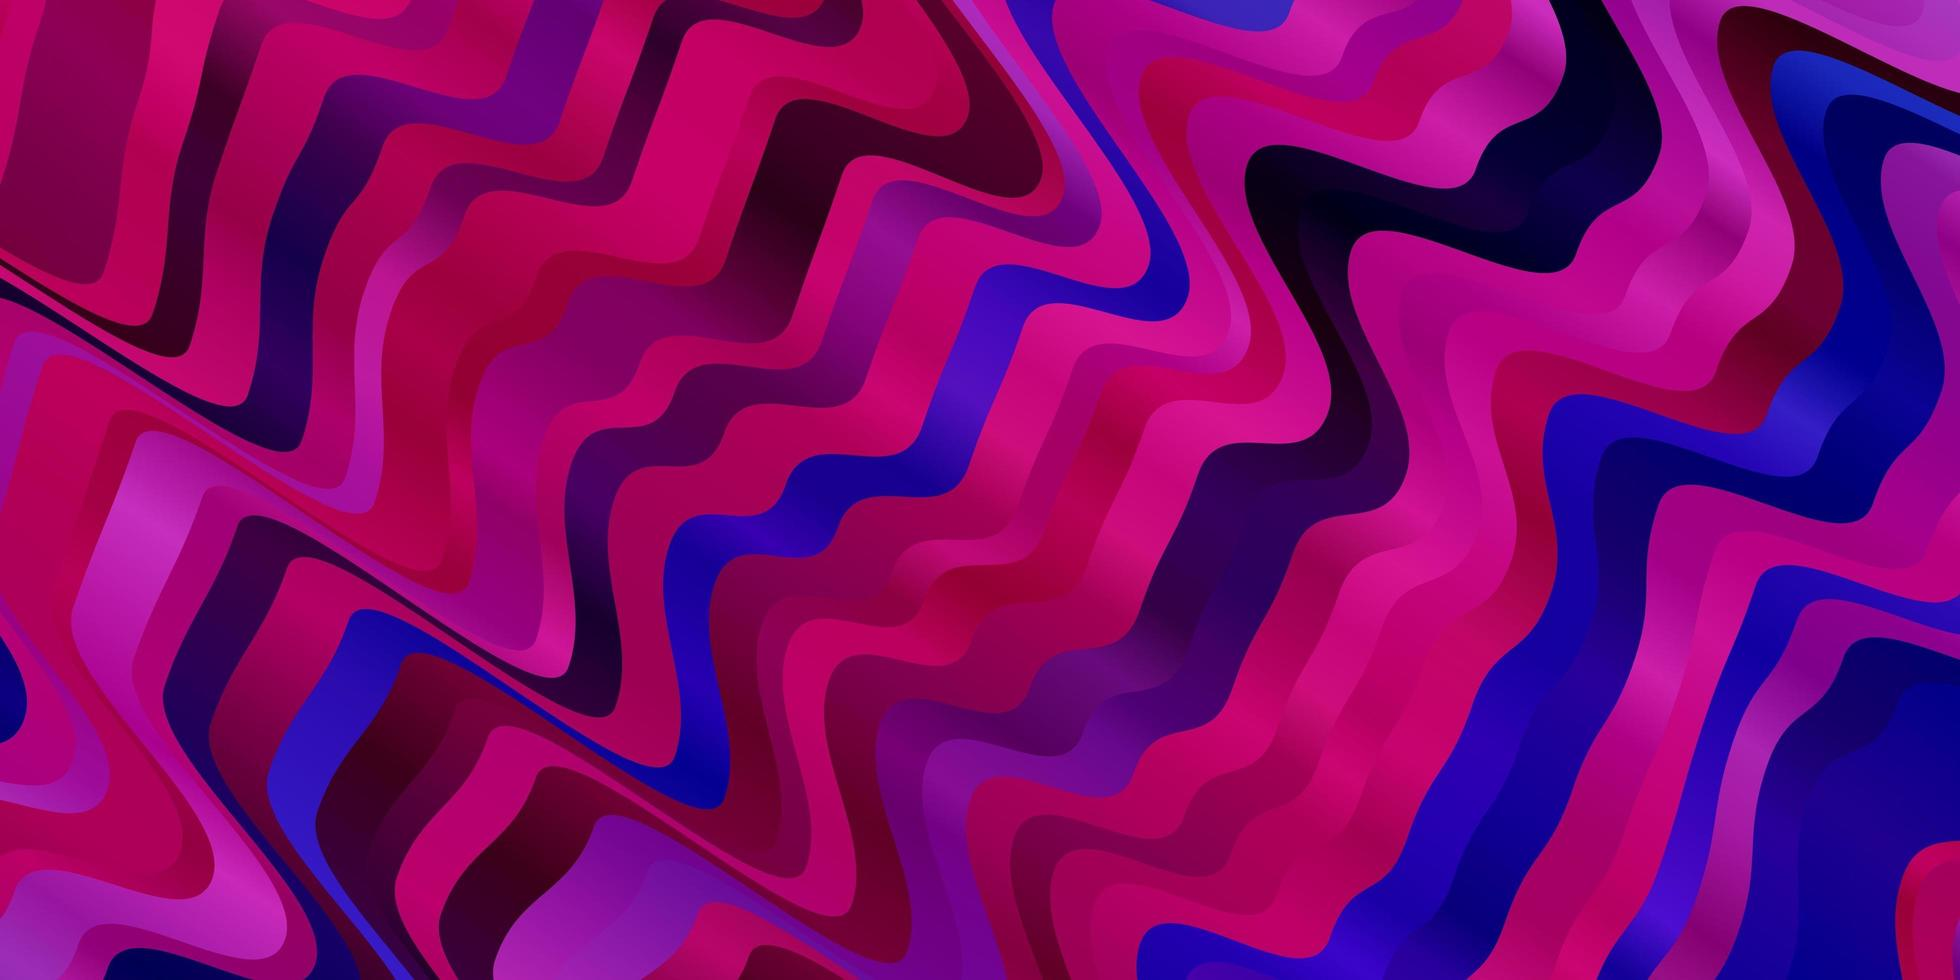 dunkelrosa, blaues Vektormuster mit gekrümmten Linien. vektor